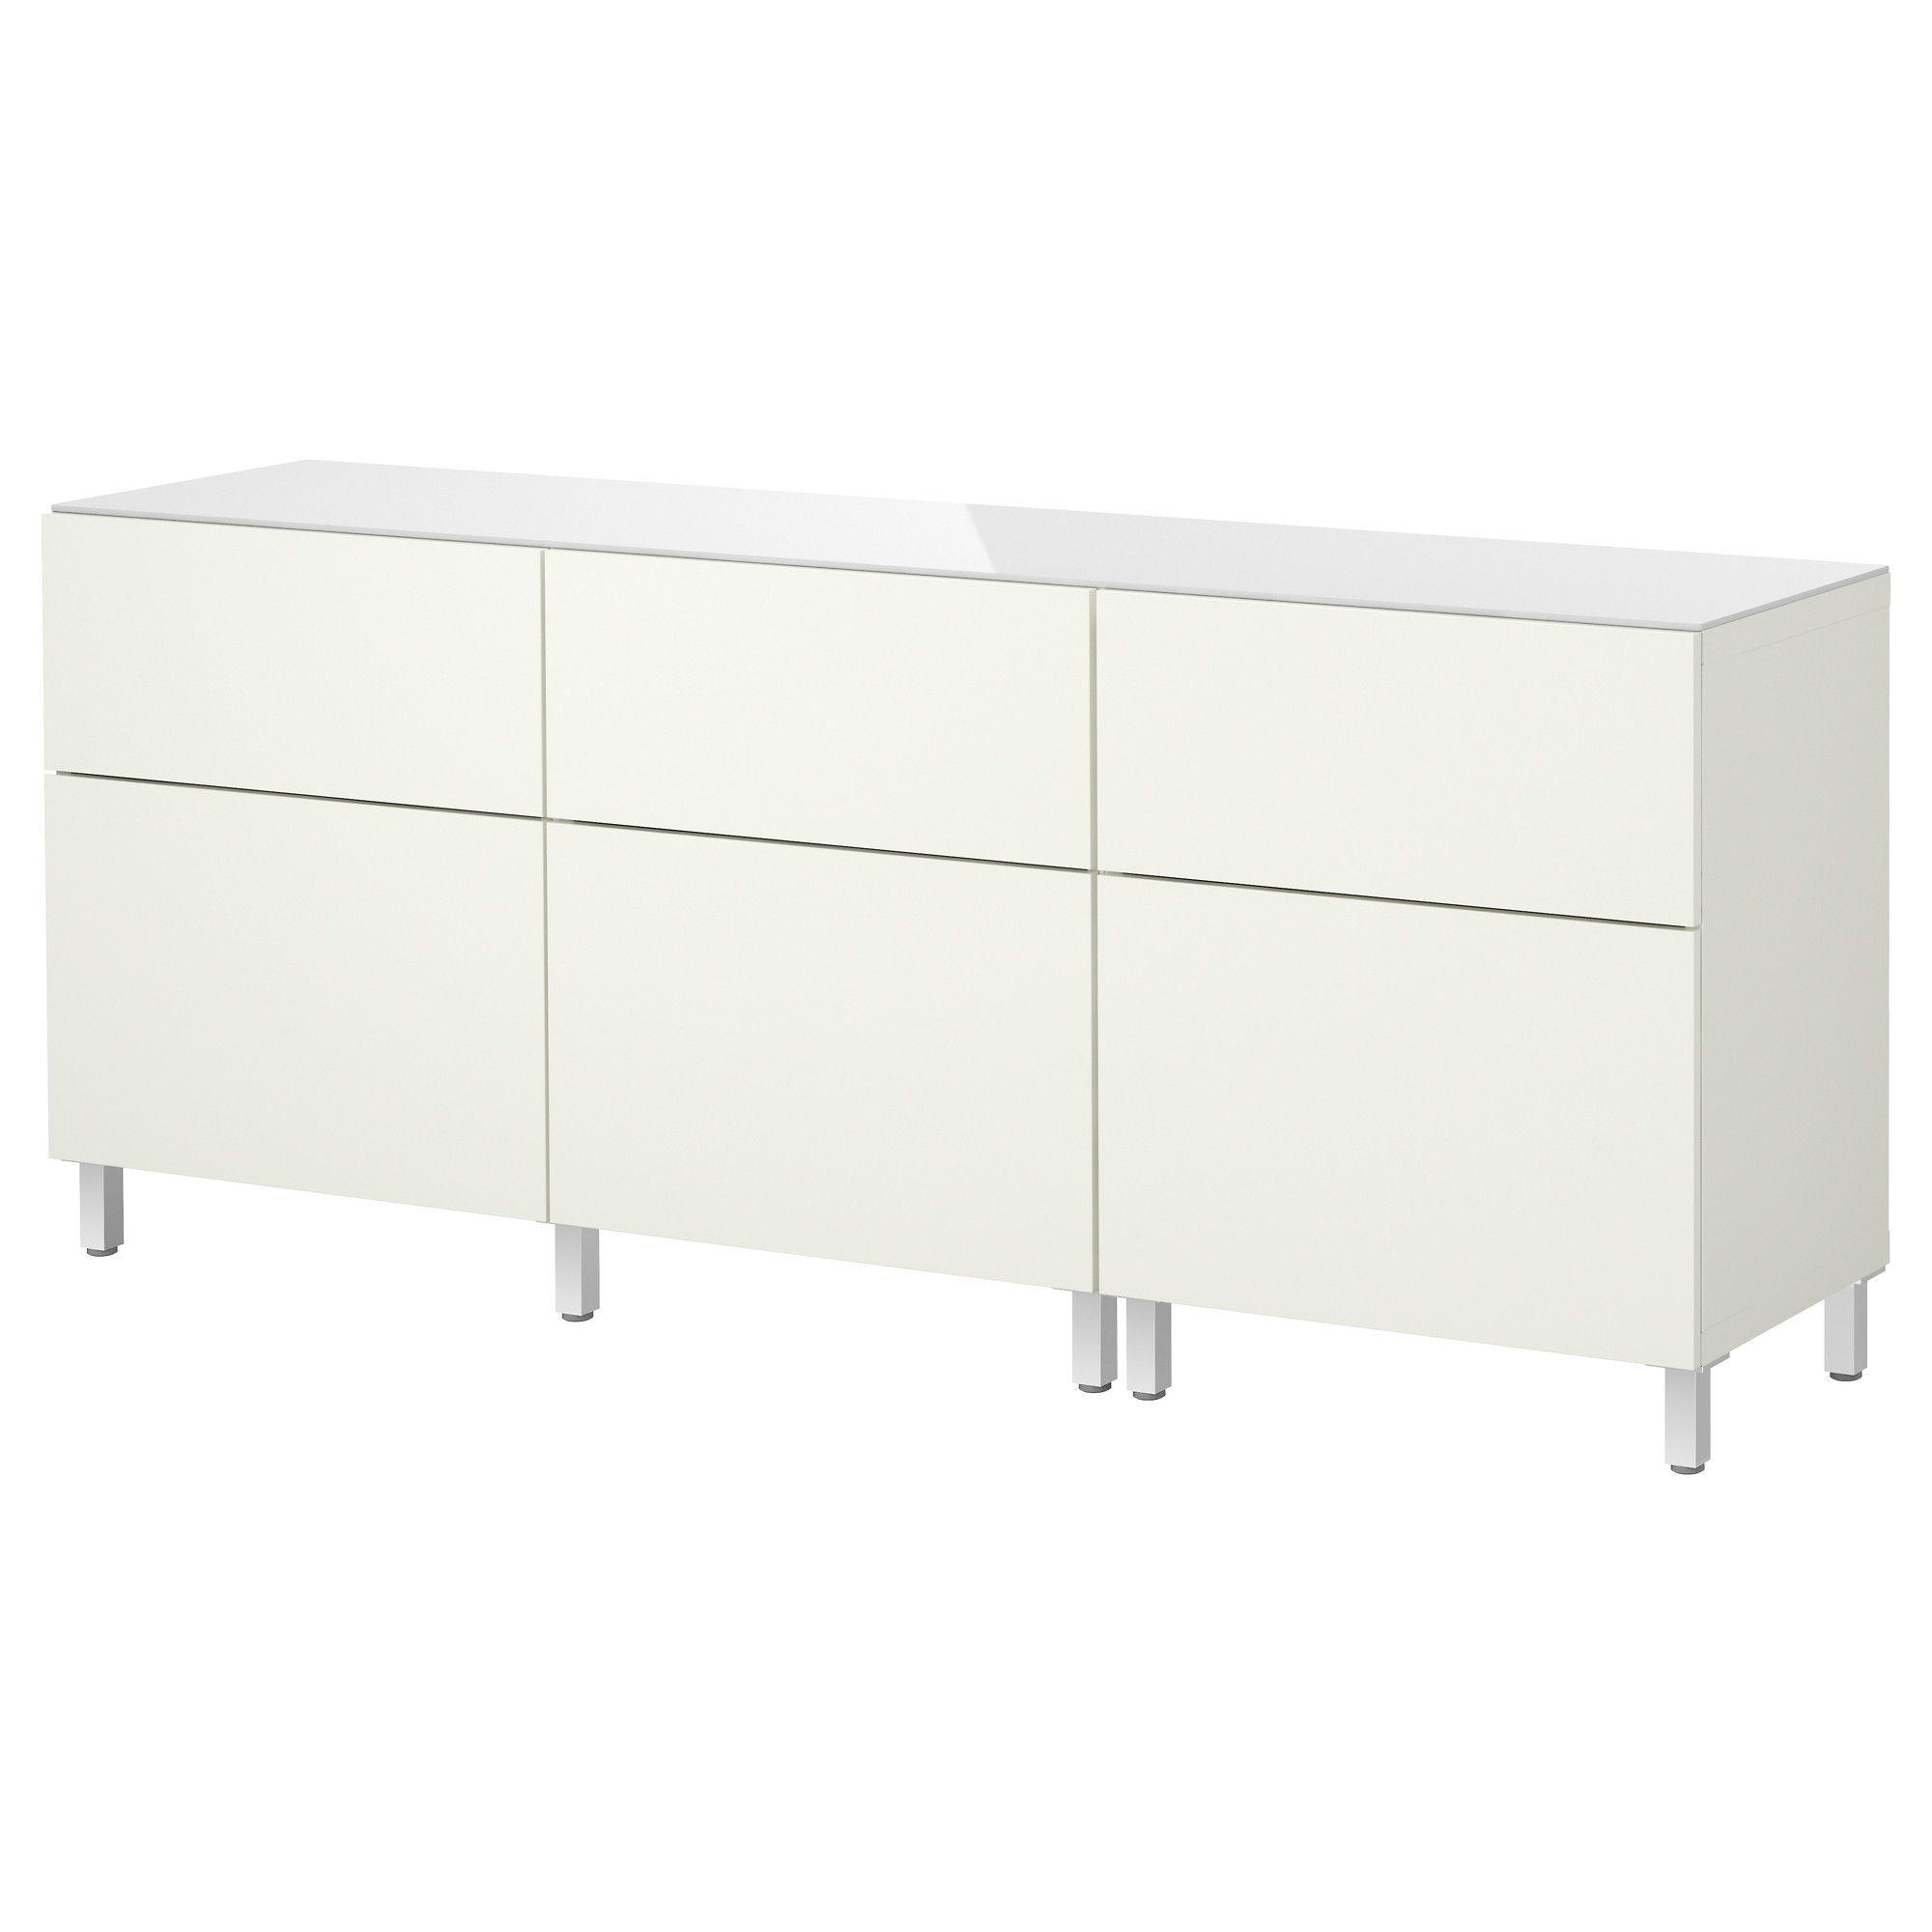 Us Furniture And Home Furnishings Ikea Storage Ikea Home